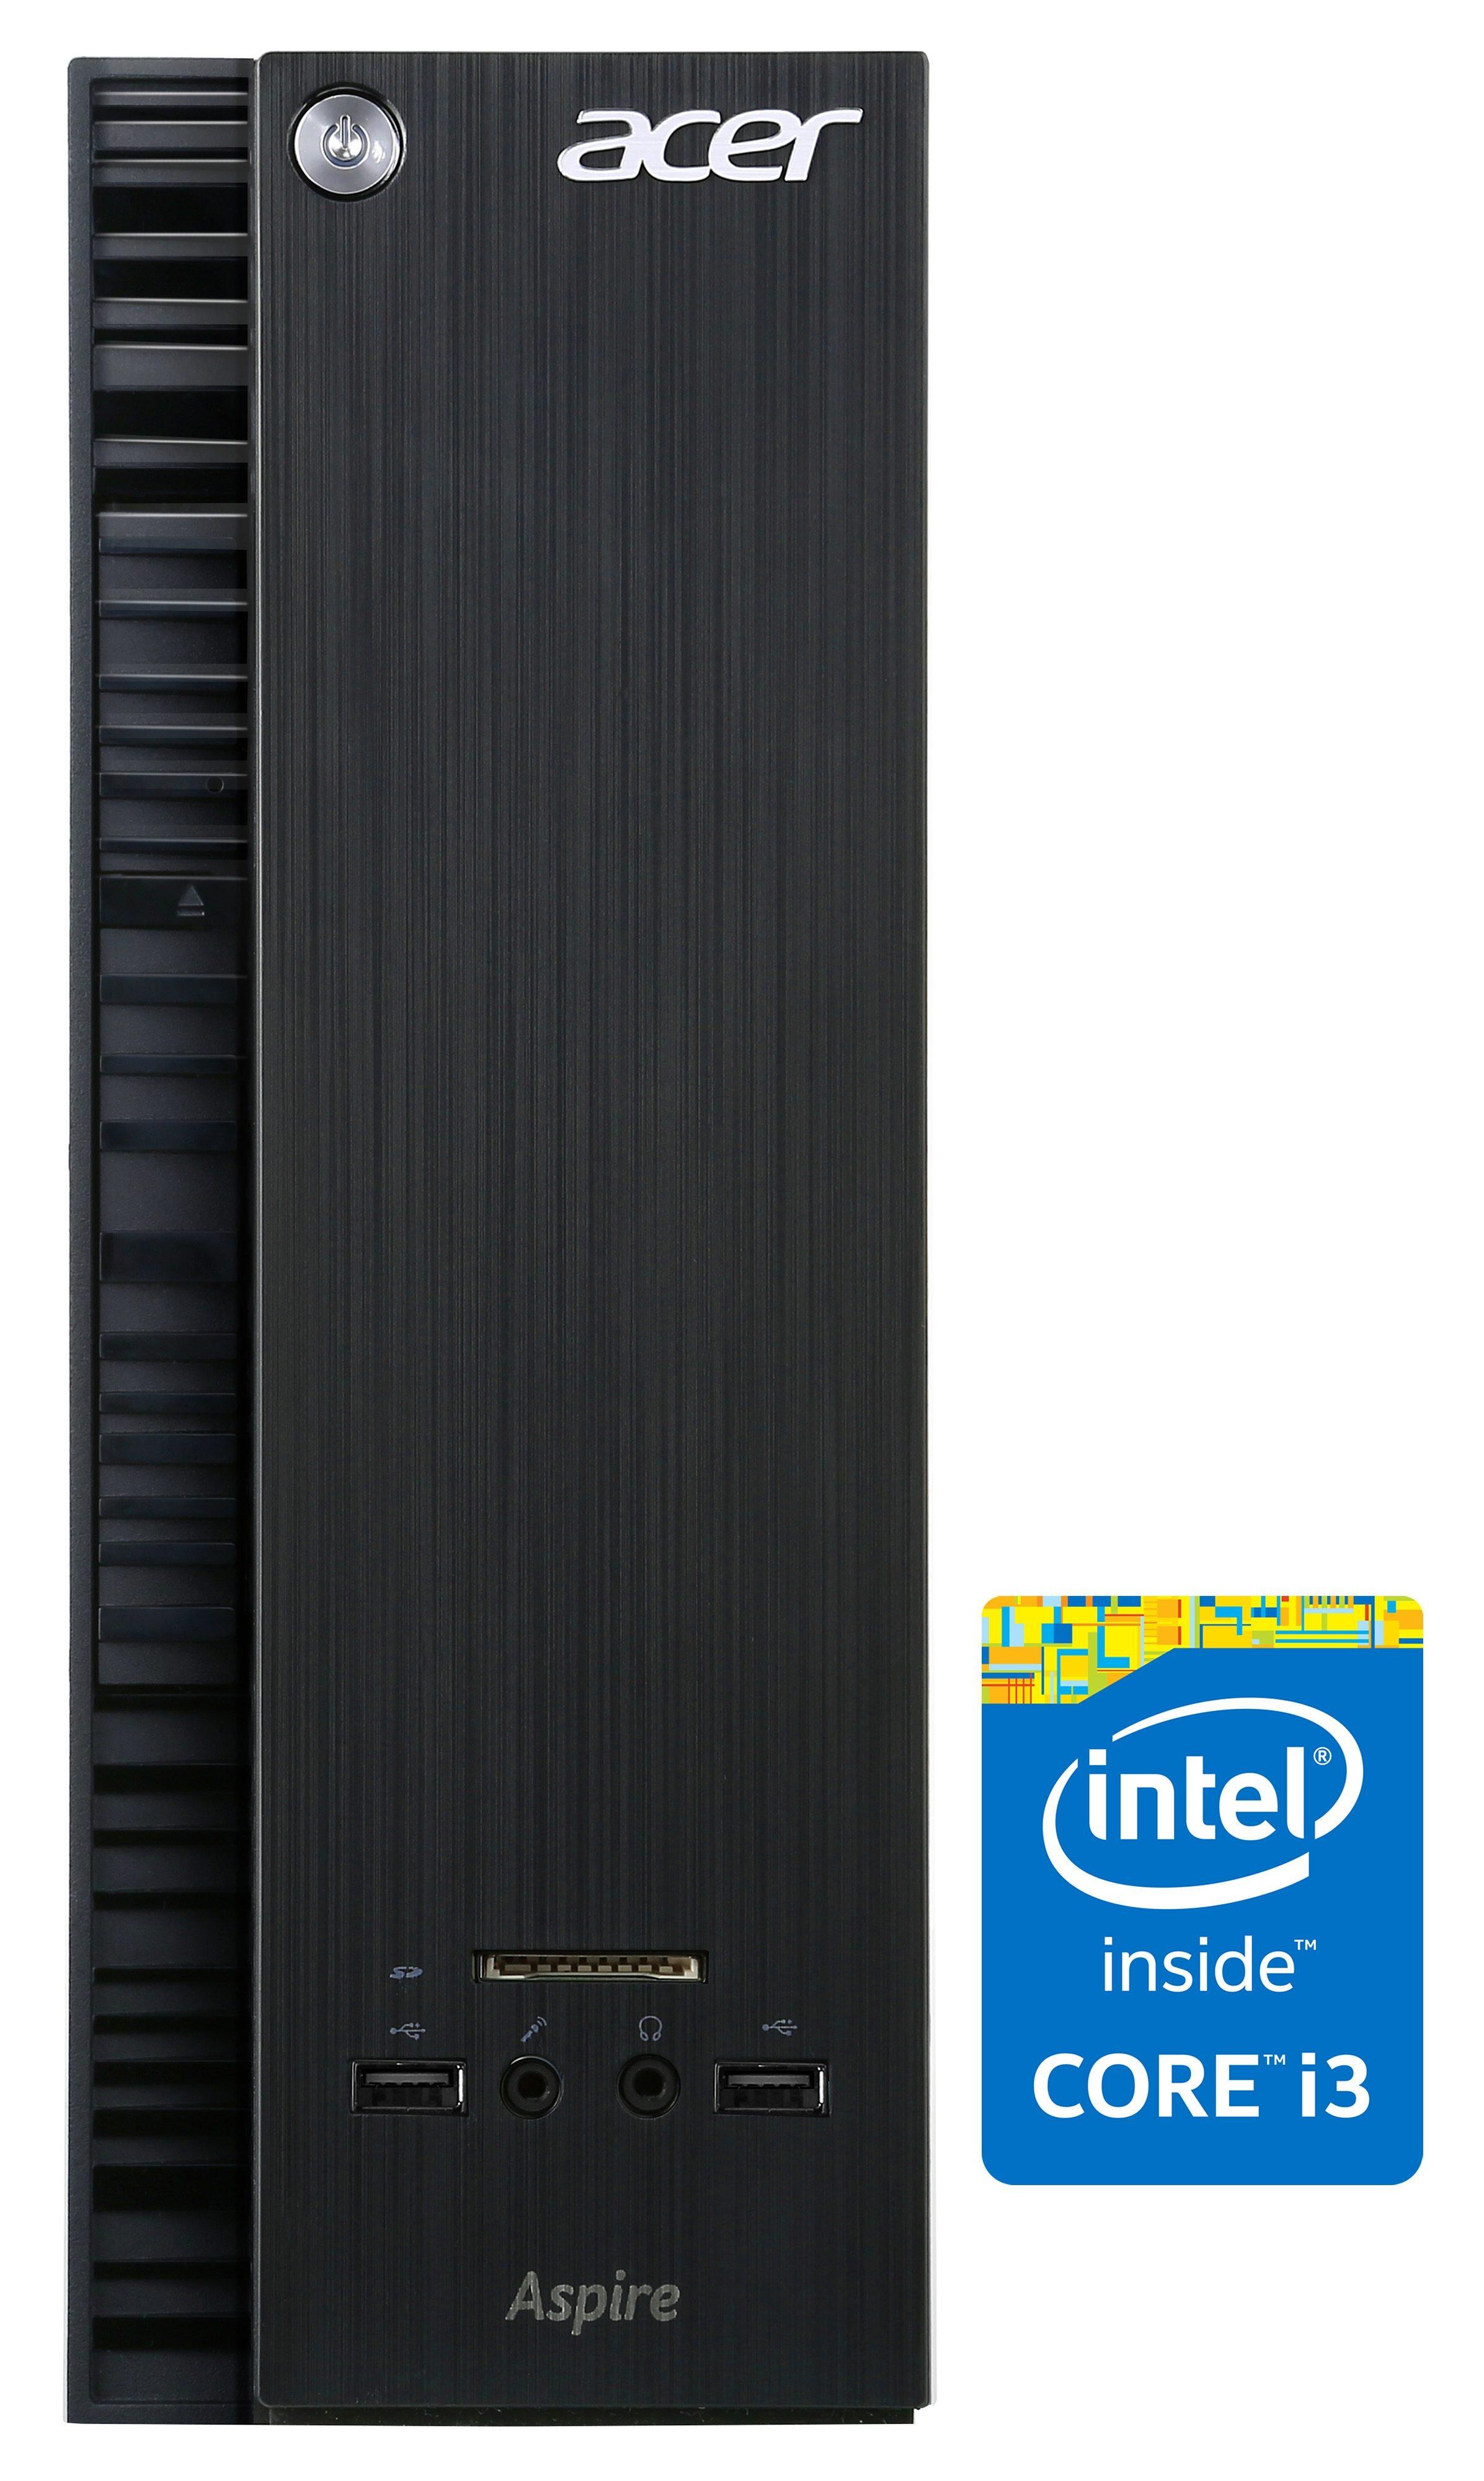 Acer Aspire XC 705 PC, Intel® Core™ i3, 4096 MB DDR3-RAM, 1000 GB Speicher